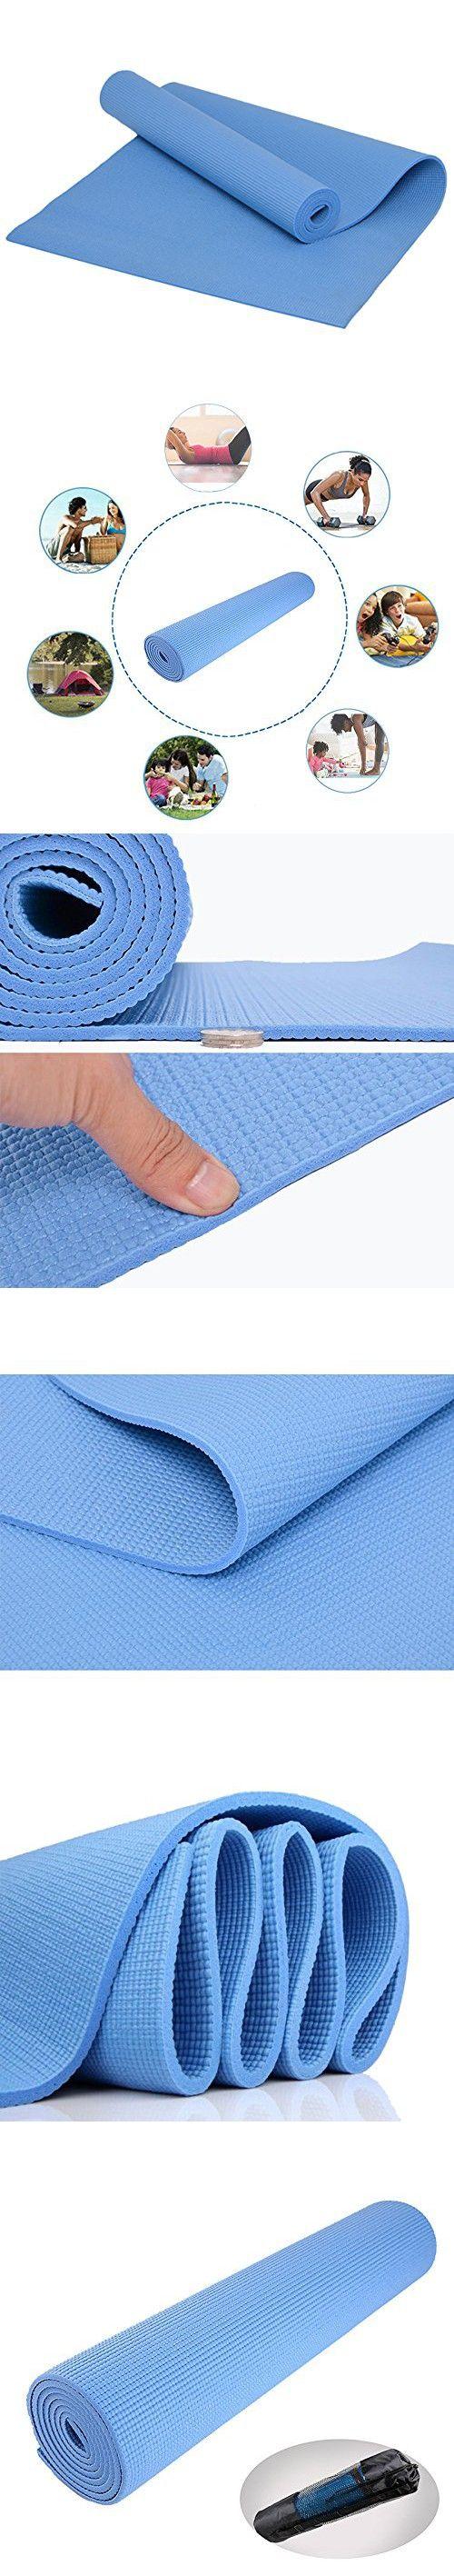 "Yoga Mat with Carry Bag, Evaline Anti-Slip High Density Anti-Tear Exercise Yoga Mat Extra Thick 1/4"" (6mm) Light Blue 68x24 inchYoga Mat (Light Blue 68x24inch)"